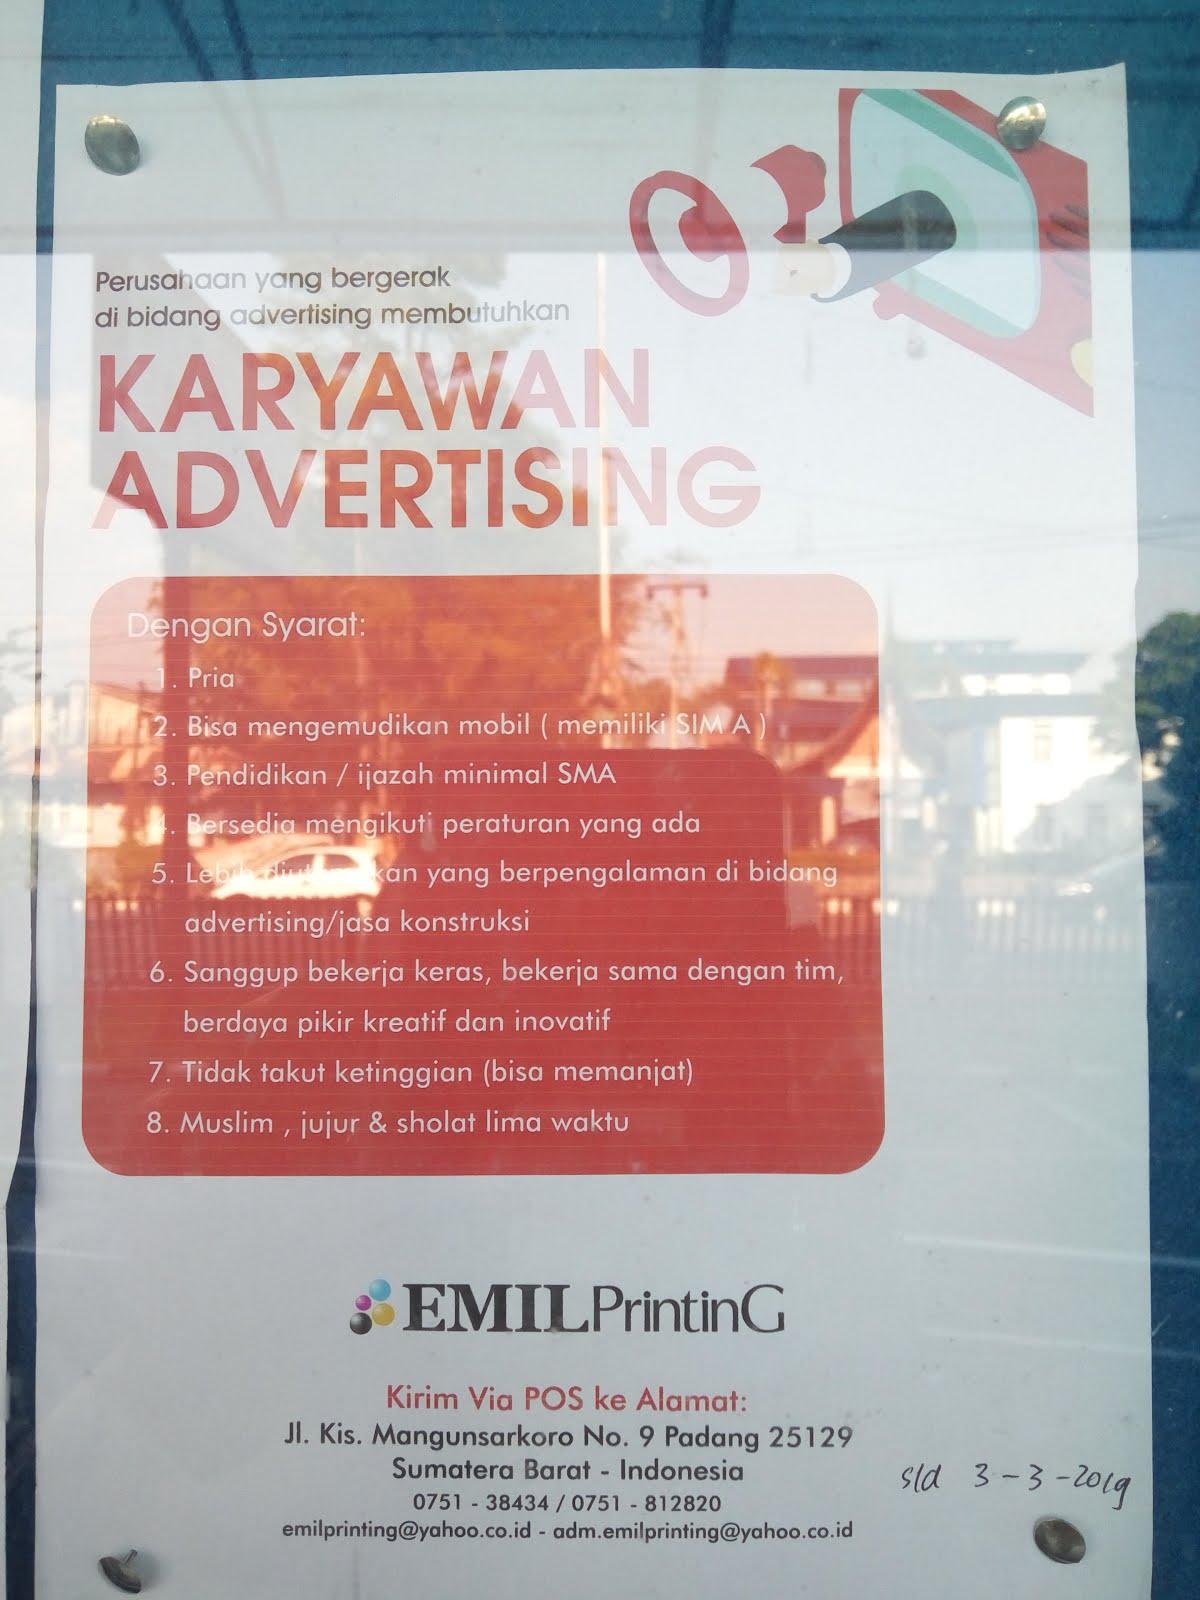 Lowongan Kerja Parttime Jogja Lowongan Kerja Spg Jogja City Mall Pulang Kuliah